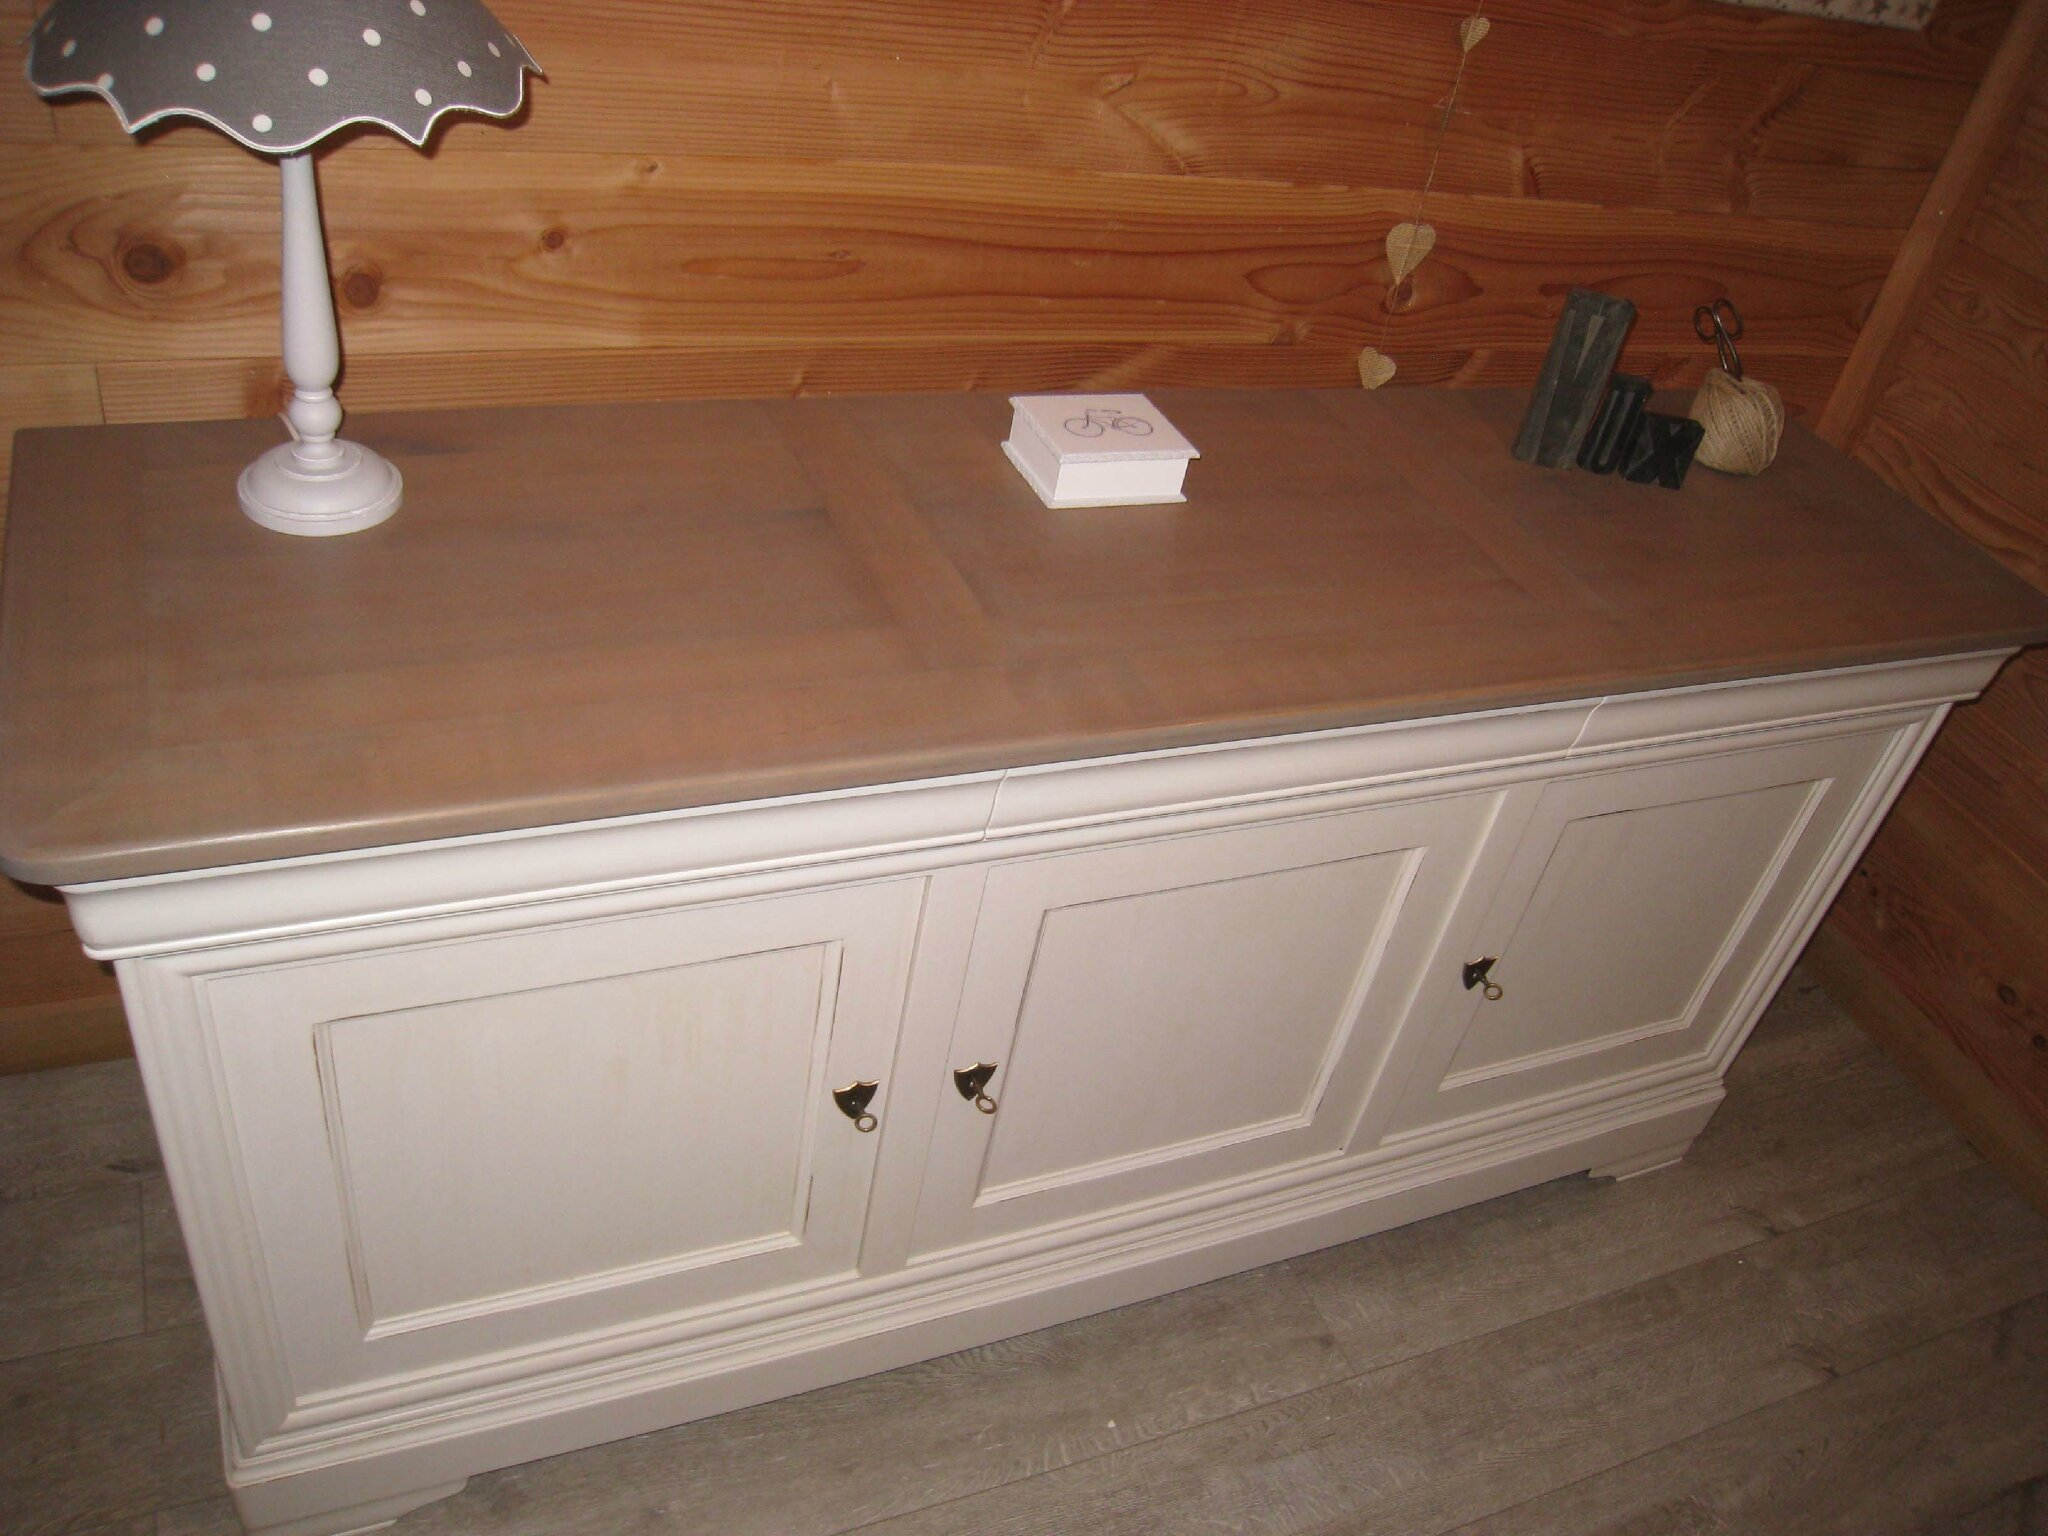 meuble relook patine commode style louis xv relooker relooking meubles des techniques de. Black Bedroom Furniture Sets. Home Design Ideas